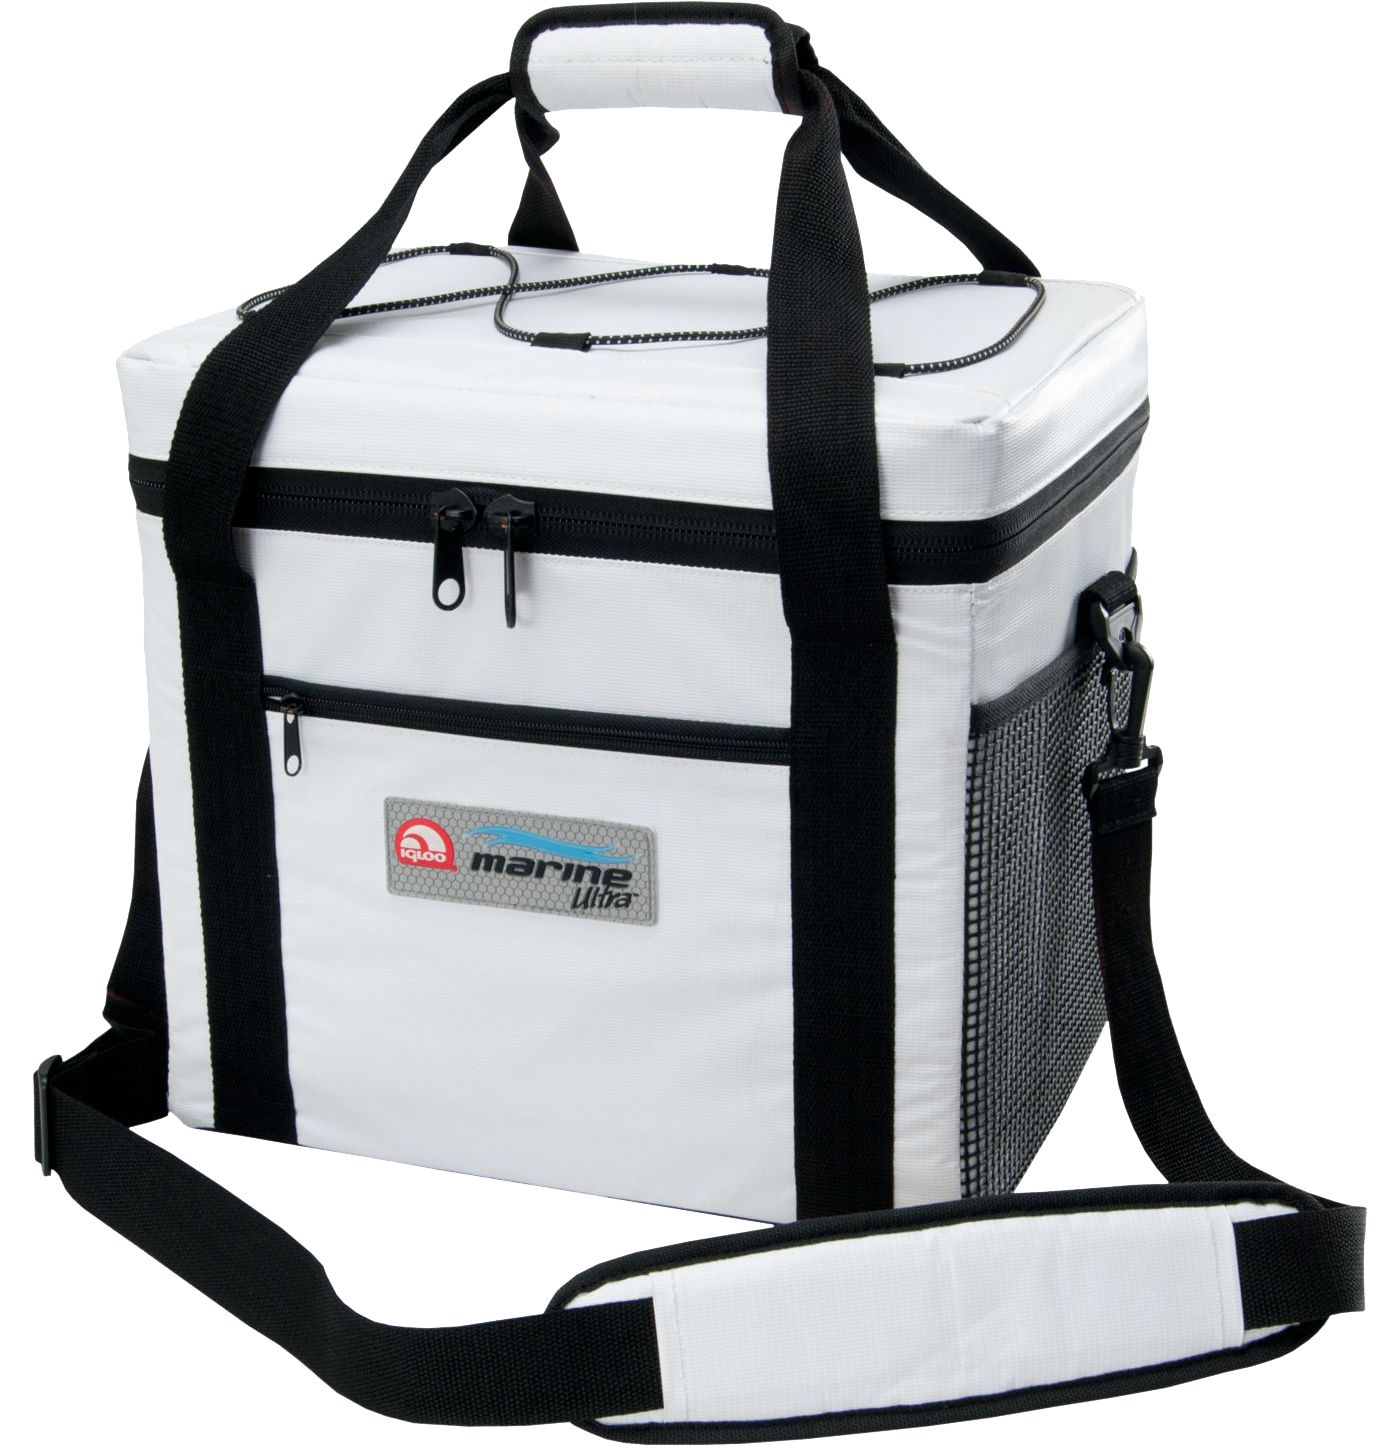 Igloo Marine Ultra 24 Can Cooler Bag